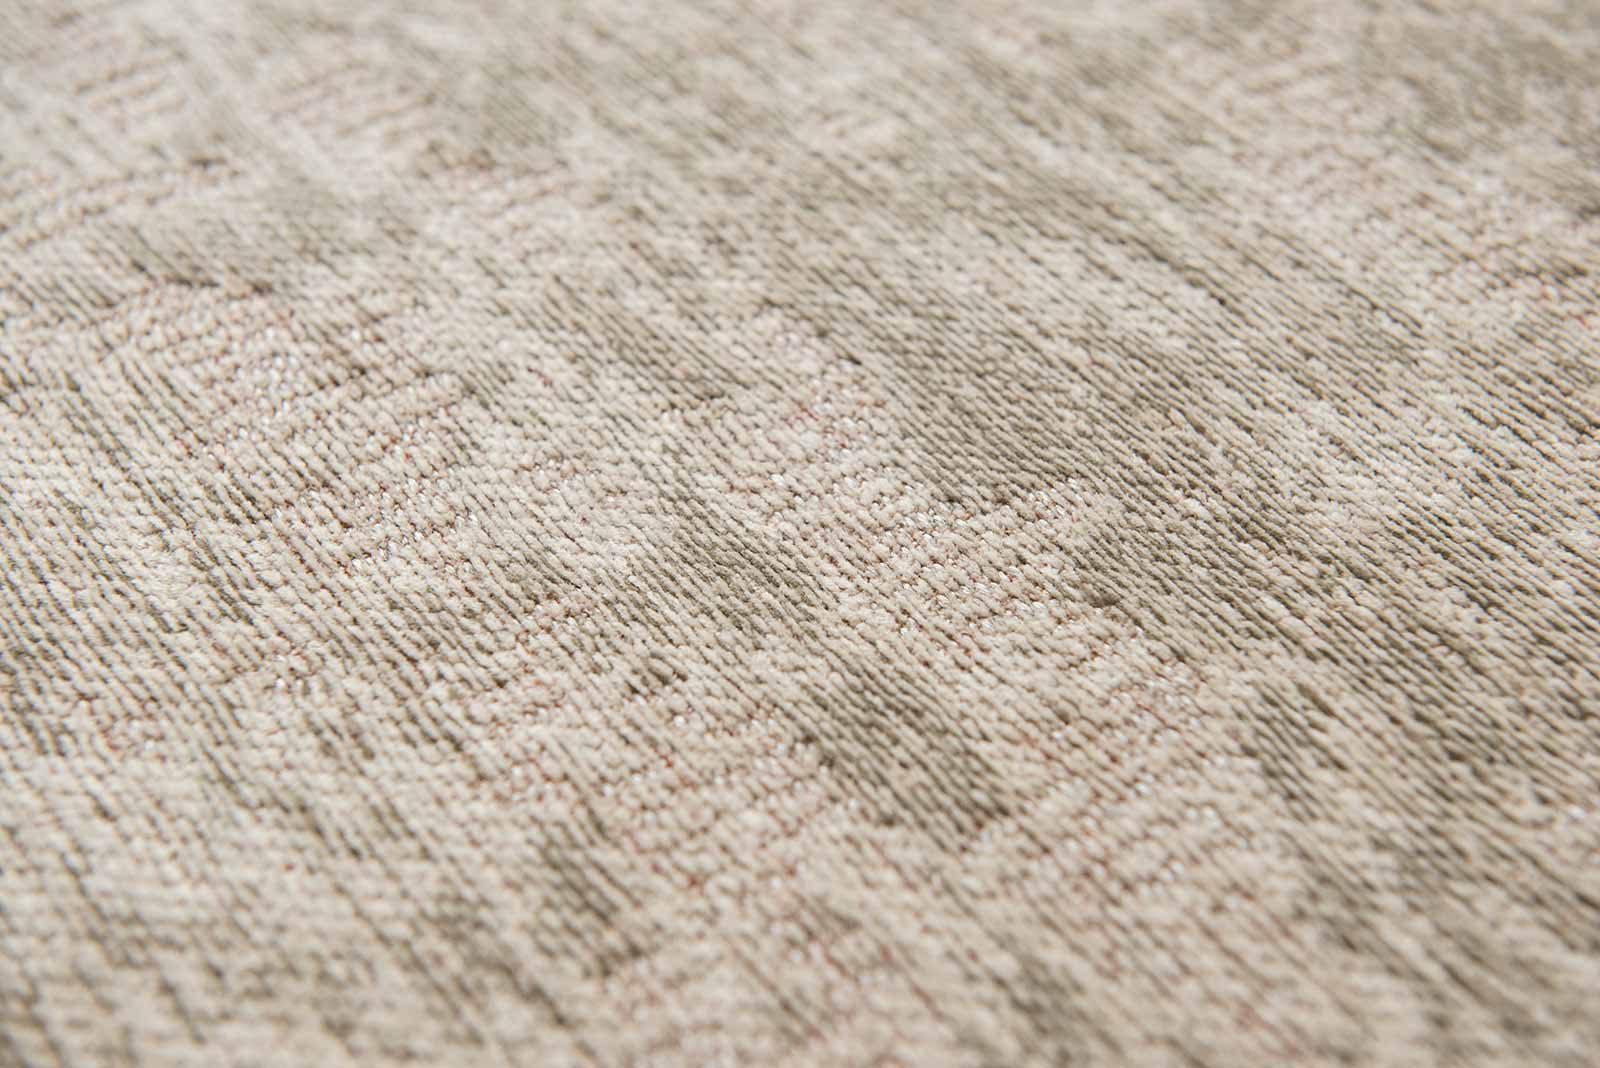 Louis De Poortere alfombras Villa Nova LX 8770 Marka Cognac zoom 2